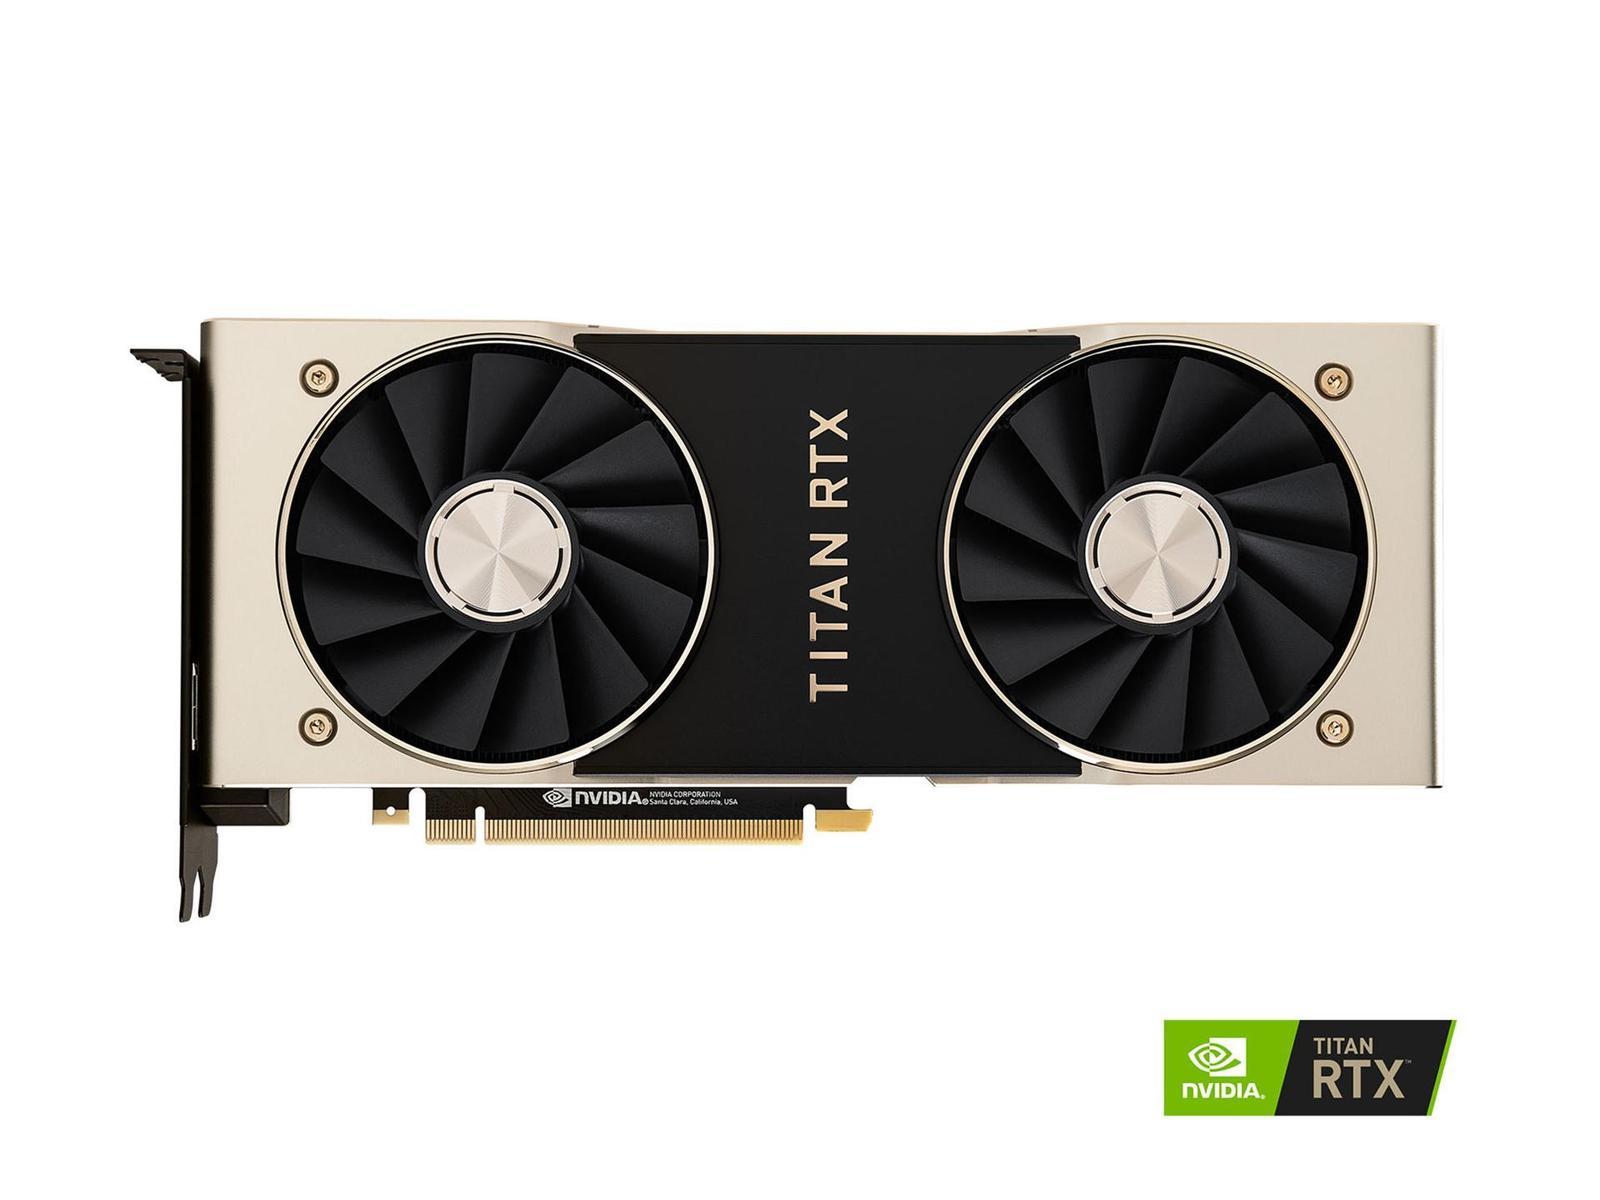 NVIDIA TITAN RTX 24 GB Video Card